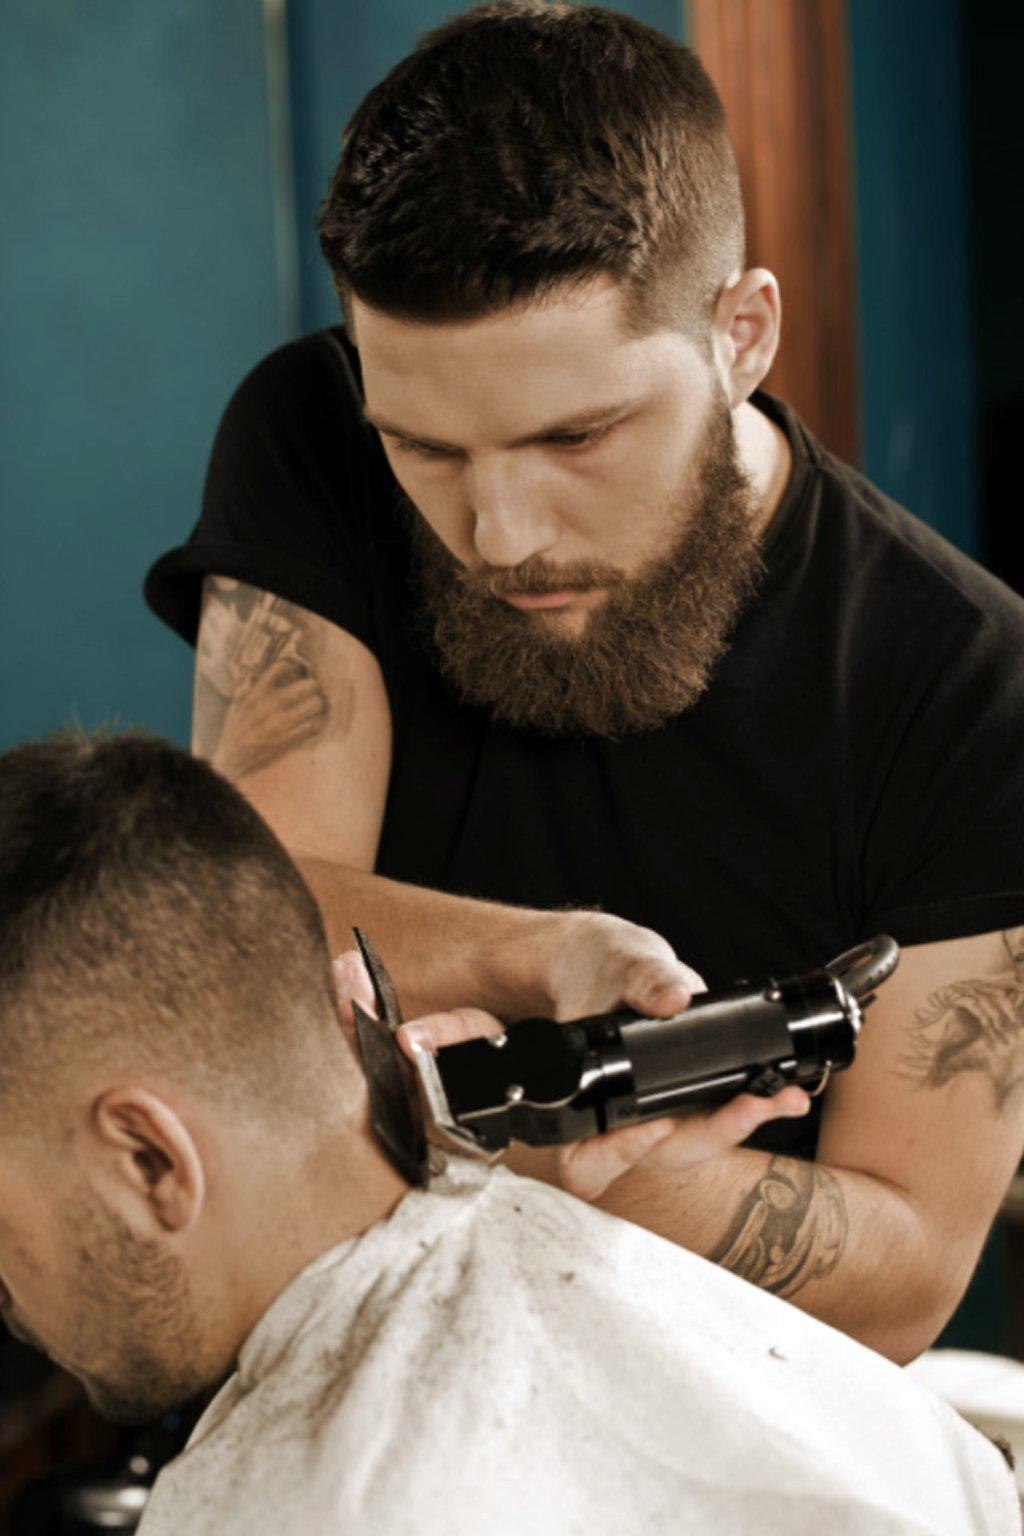 Barber 5